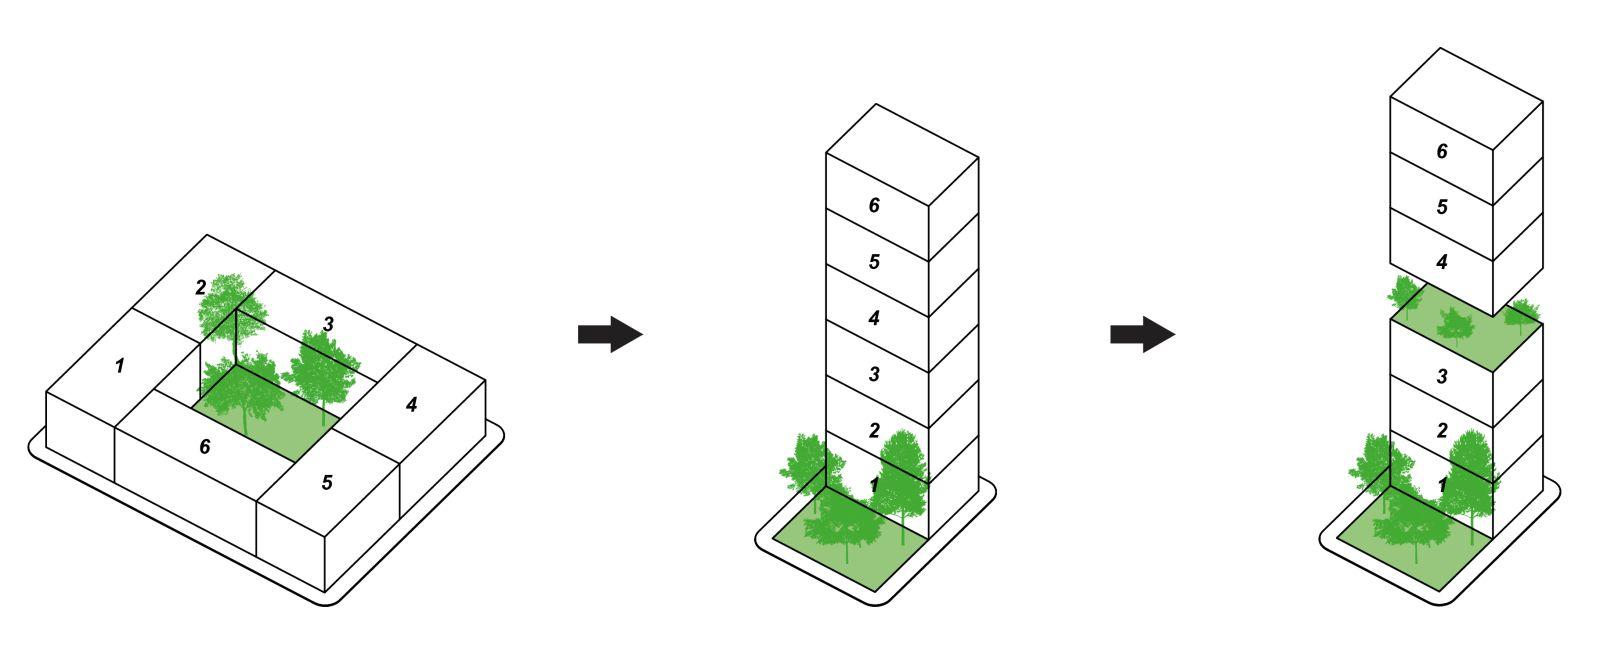 Féval Tower